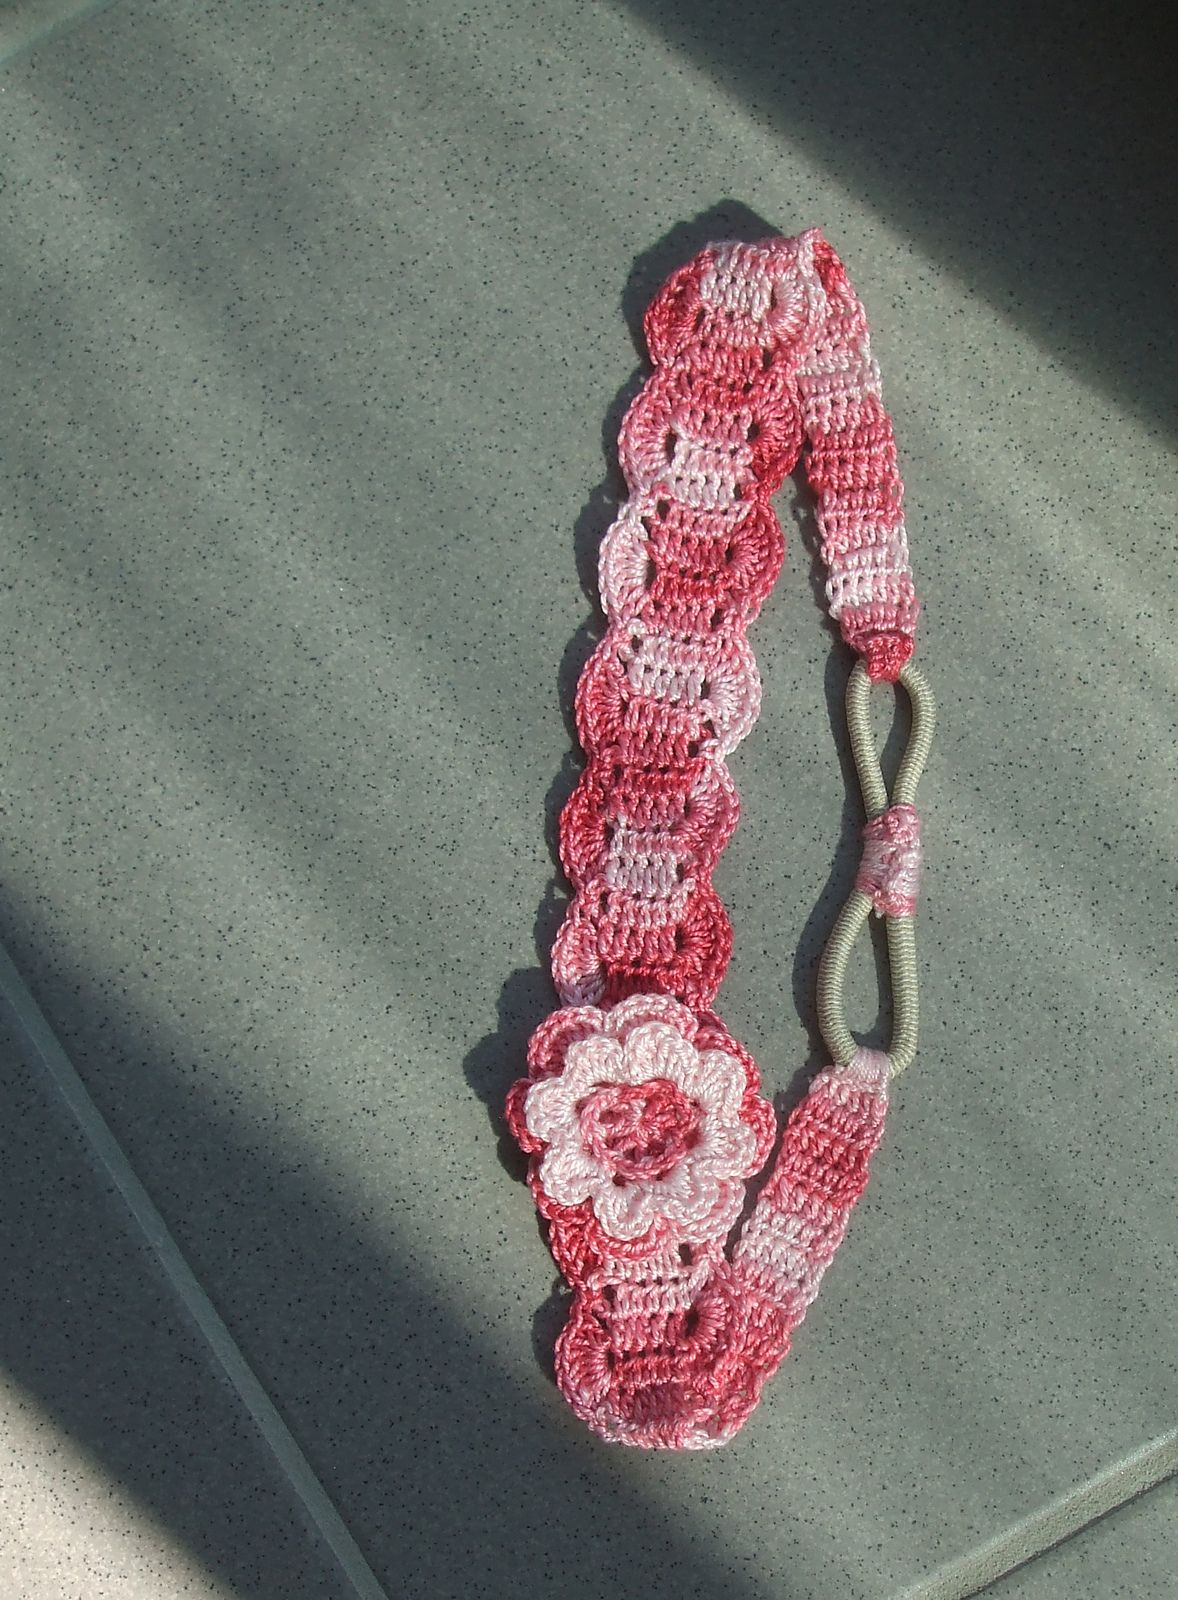 Ravelry: Thread headband by Kinga Erdem